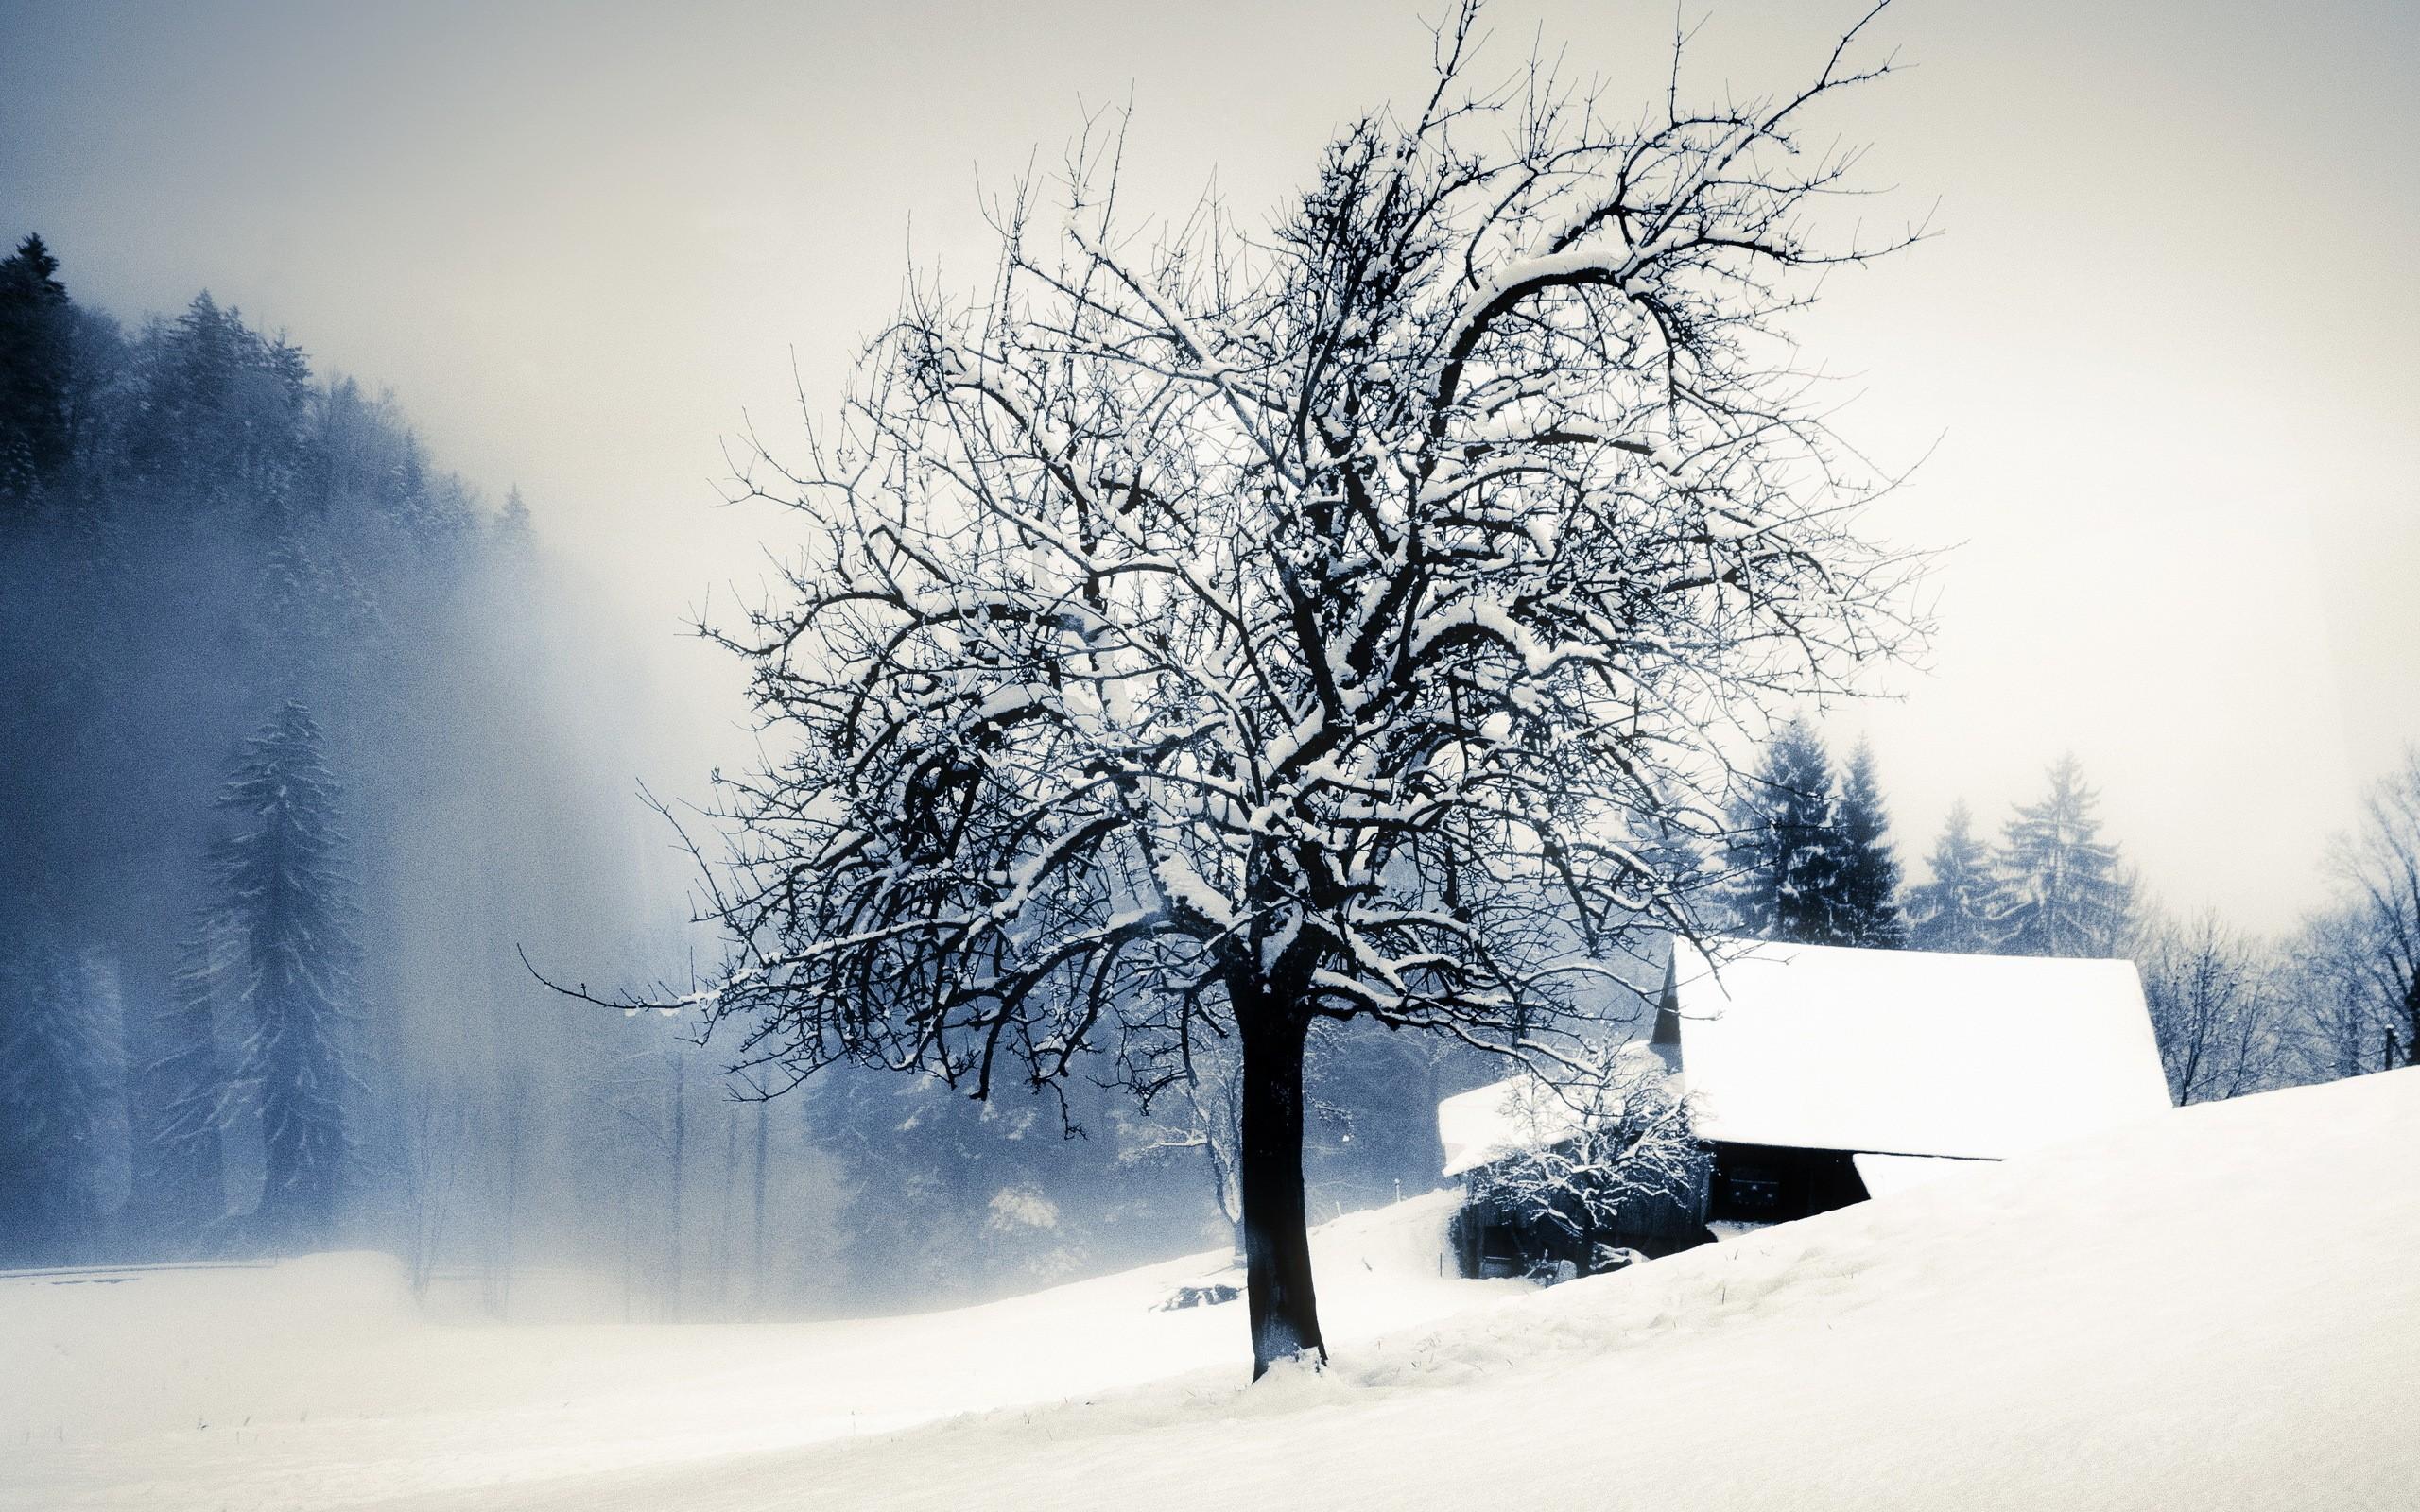 General 2560x1600 landscape trees nature winter snow